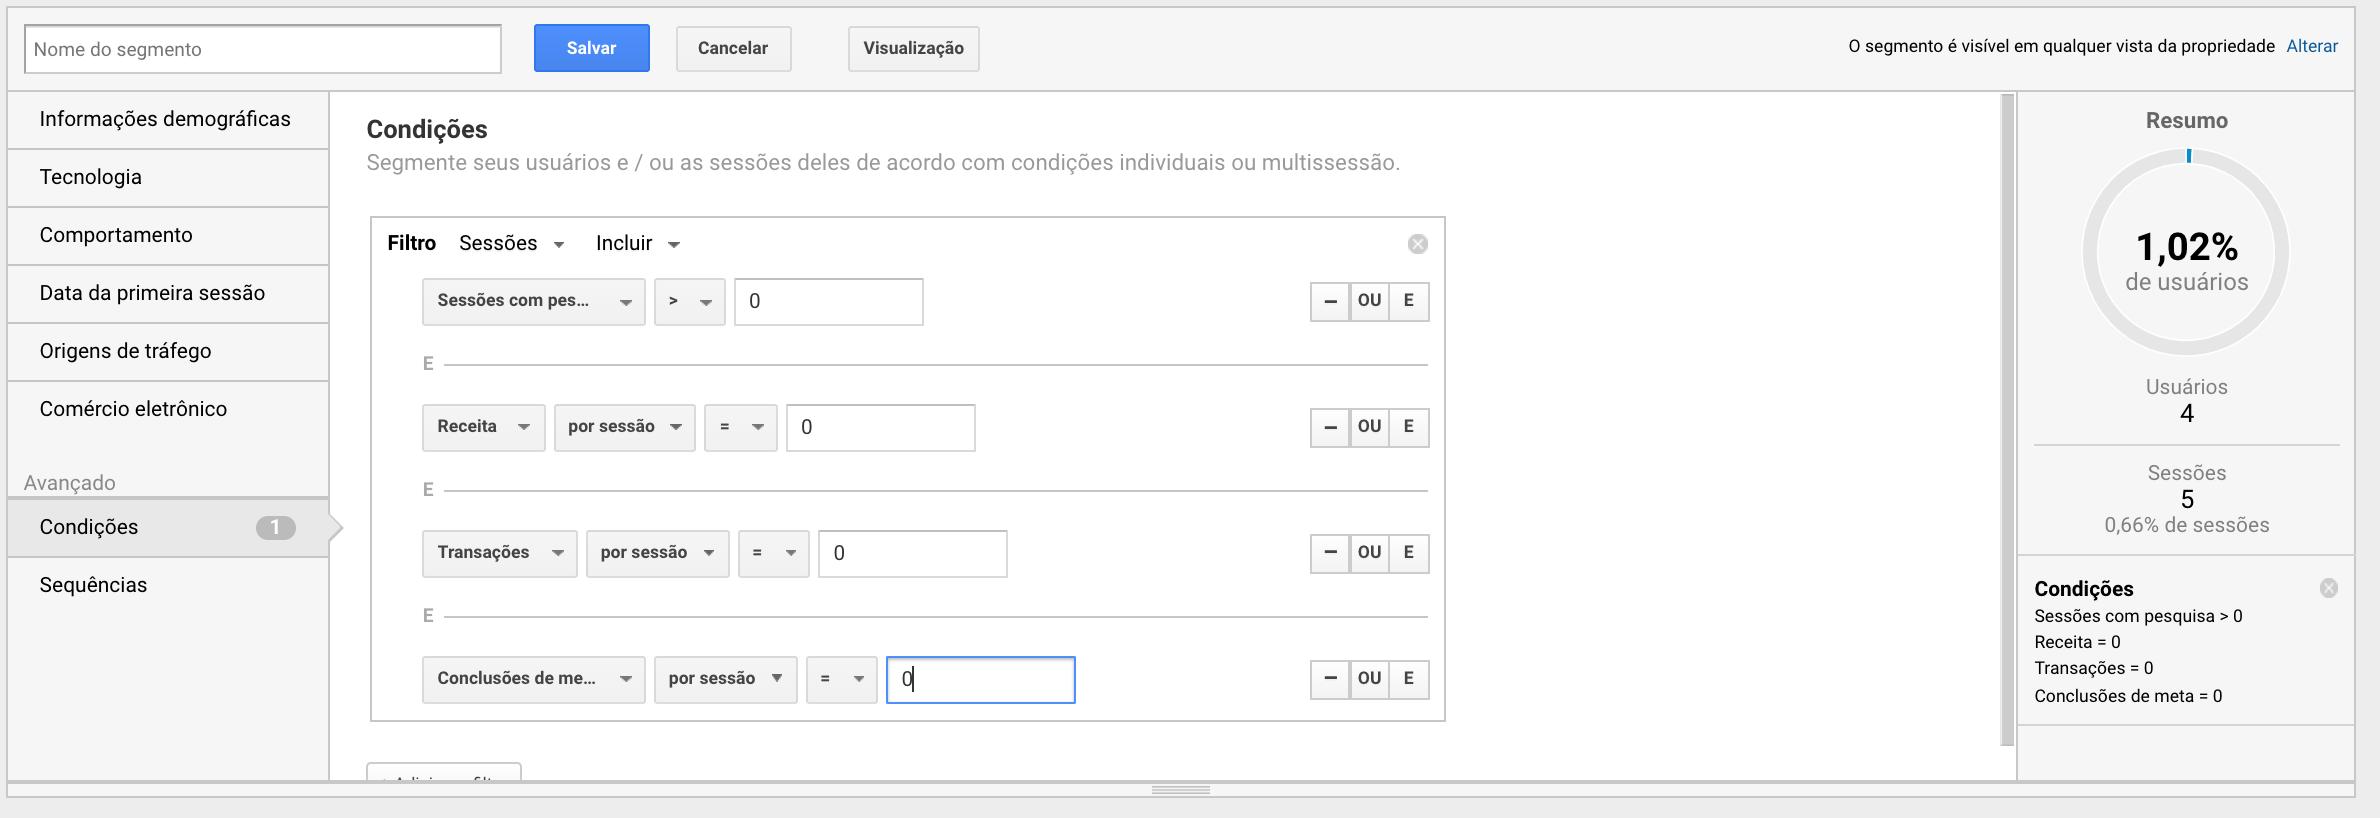 googleanalytics-listaremarketing4 (1).png